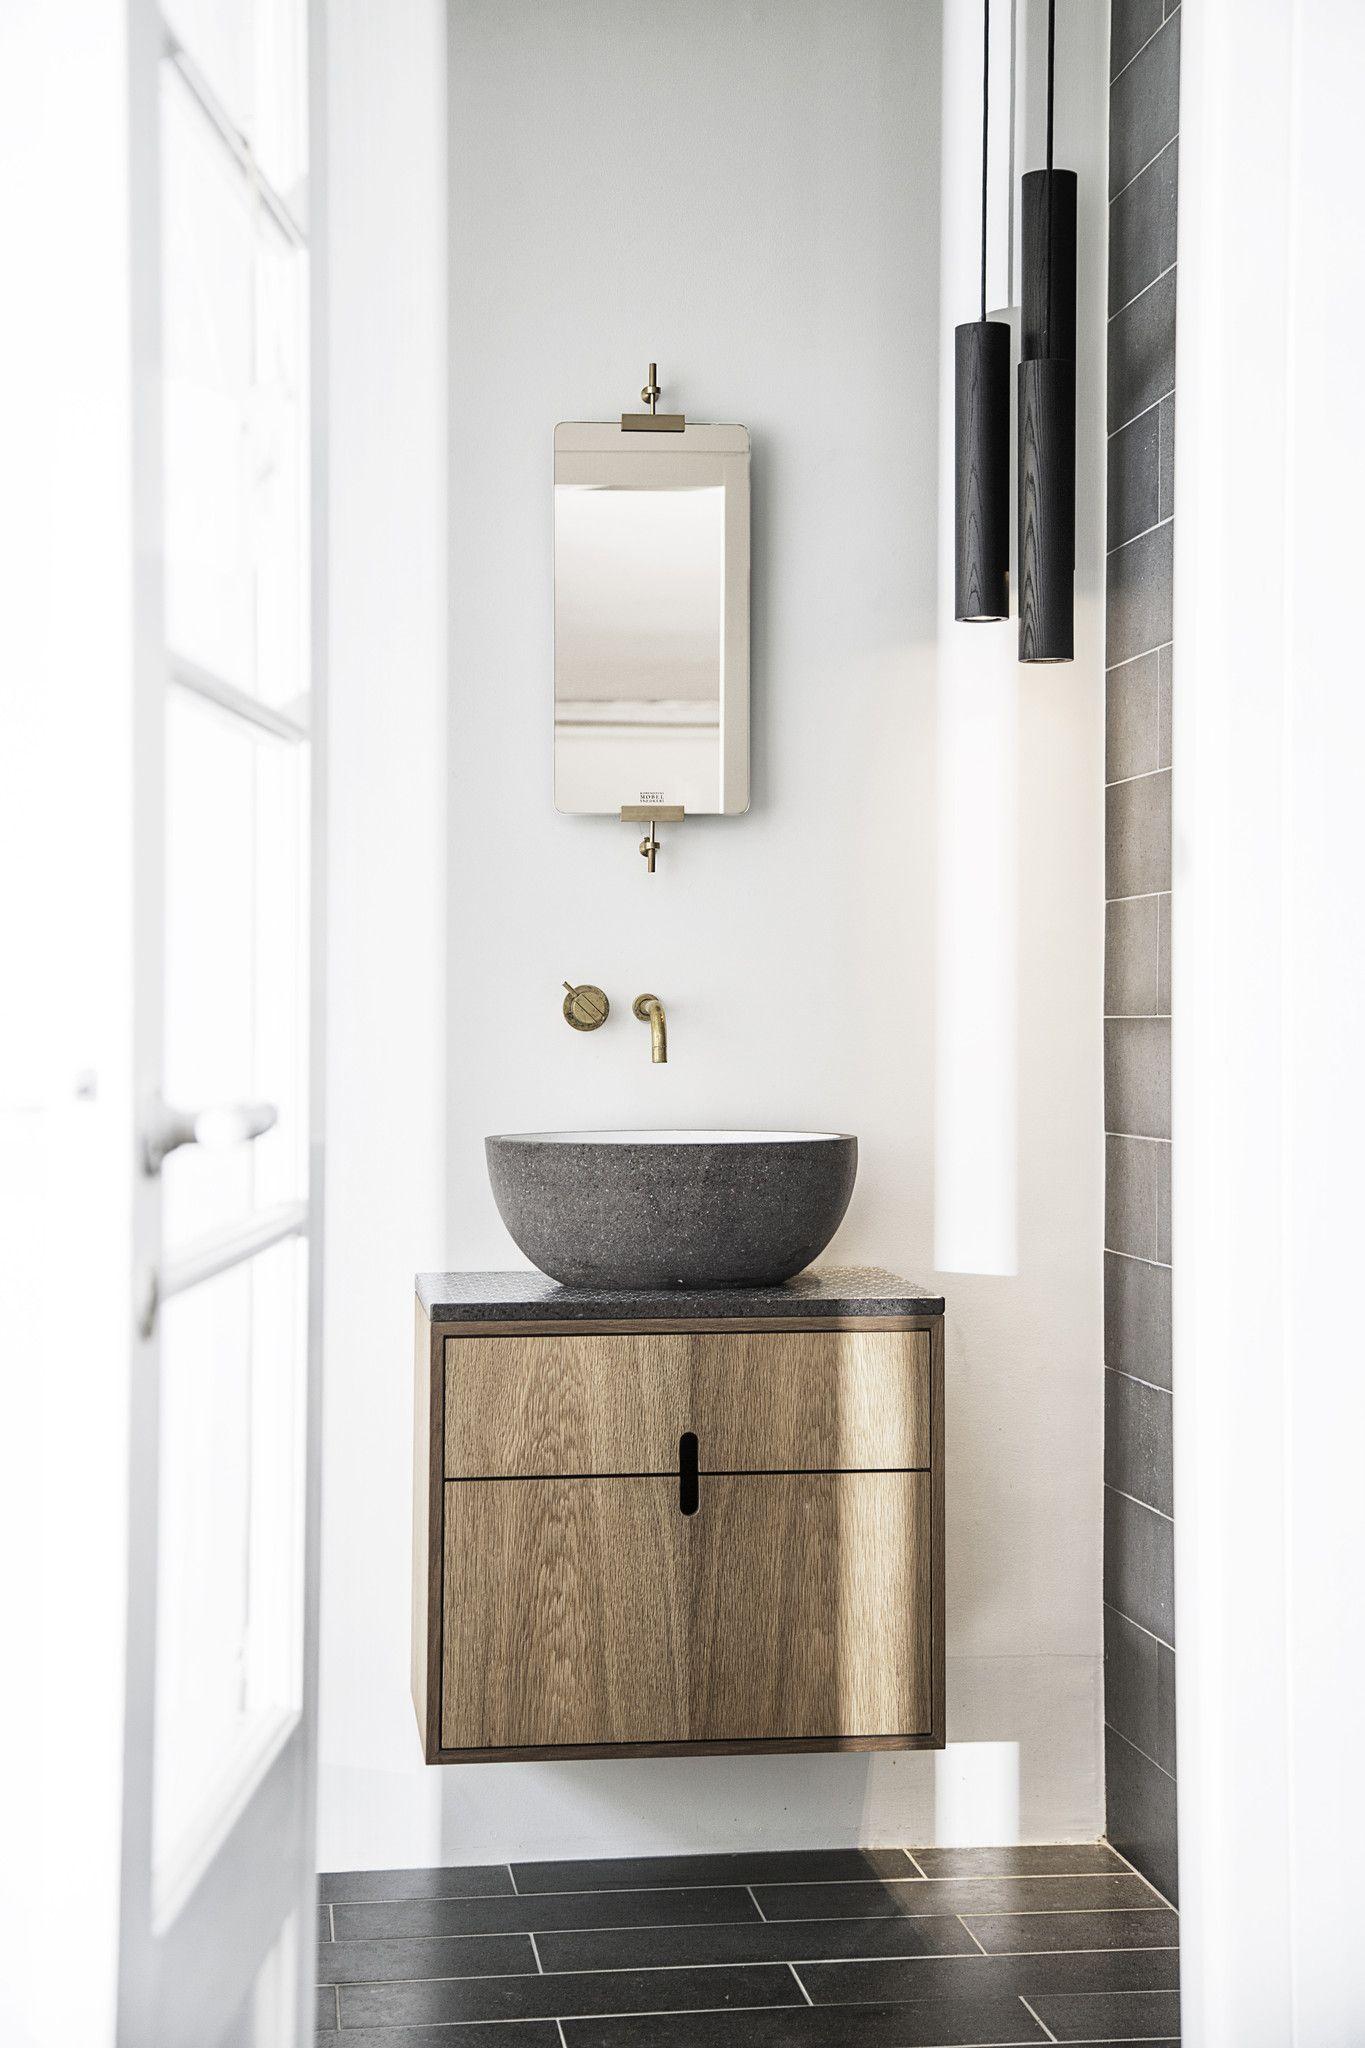 KBH Mirror | Bath, Bath room and Interiors